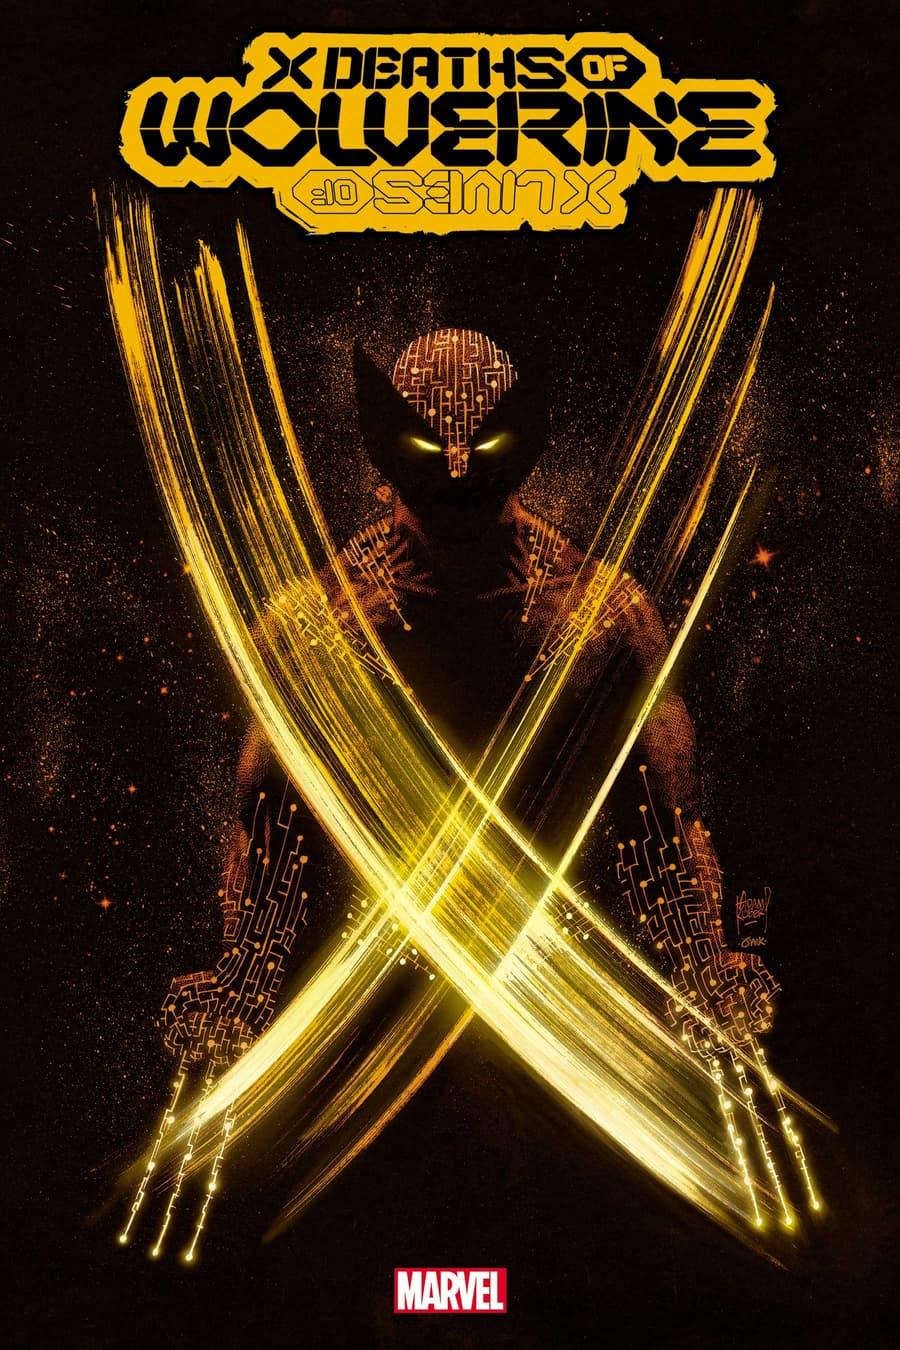 X DEATHS OF WOLVERINE #1 cover by Adam Kubert